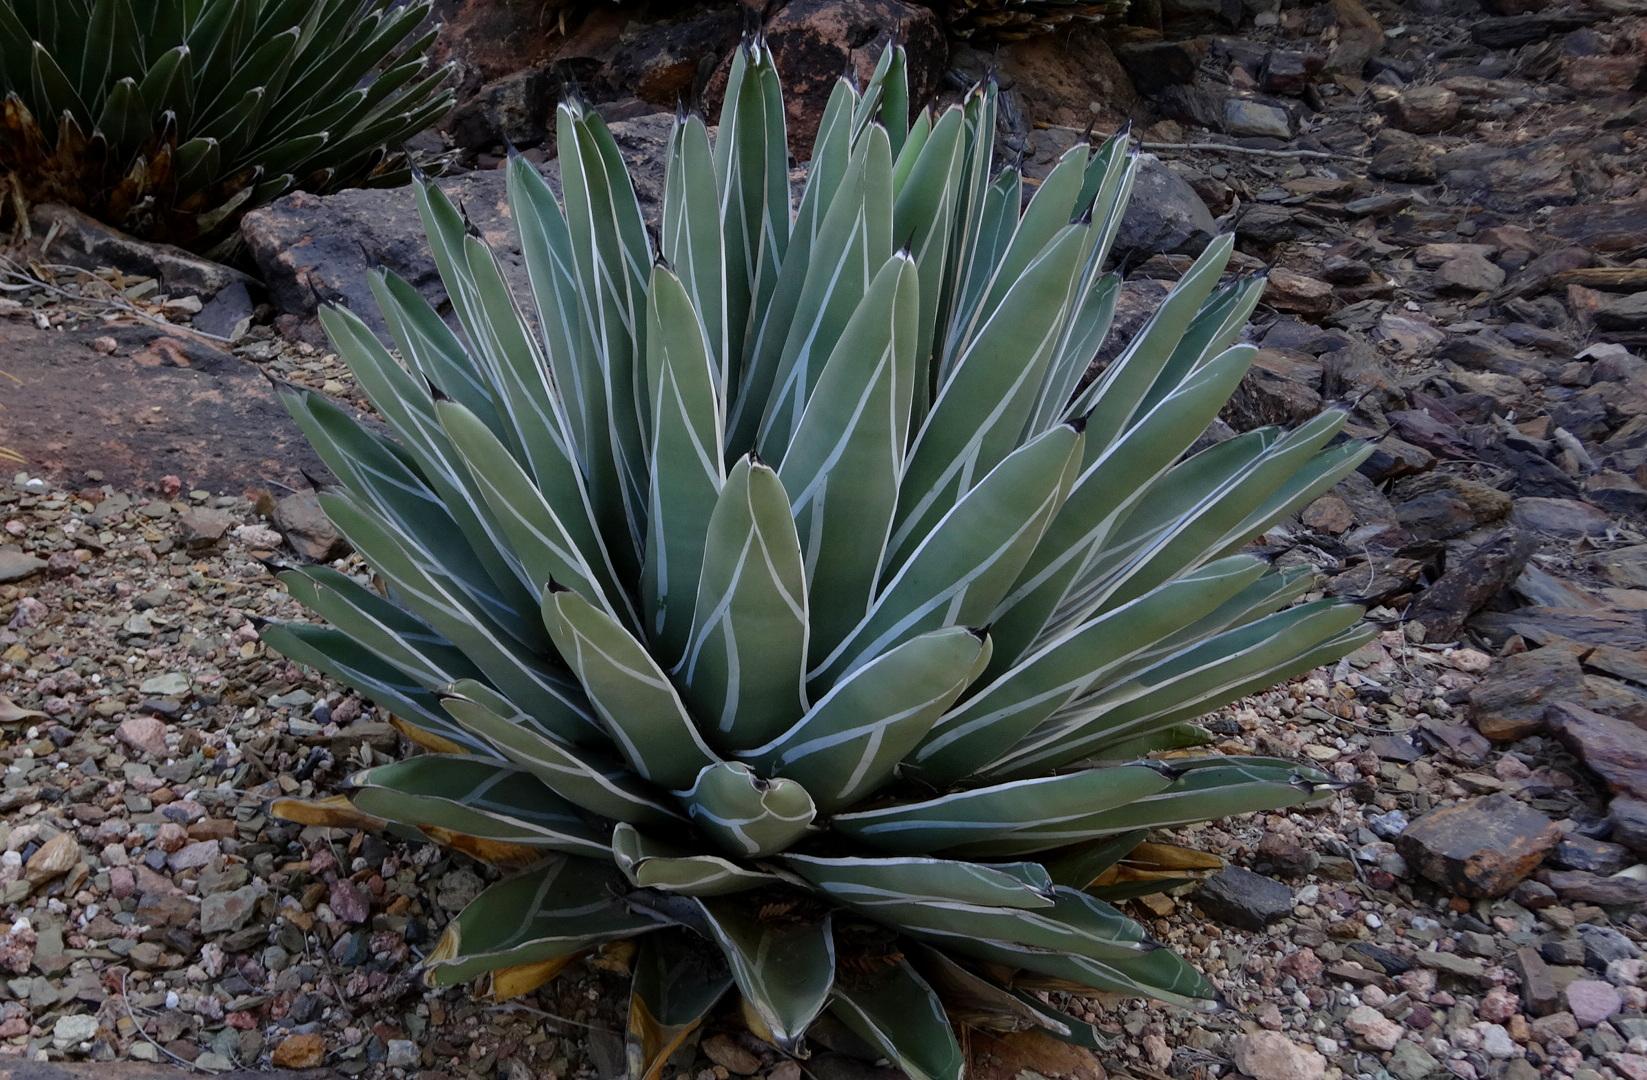 A beautiful, fully mature  Agave nickelsiae  at the Desert Botanical Garden, Phoenix, Arizona.